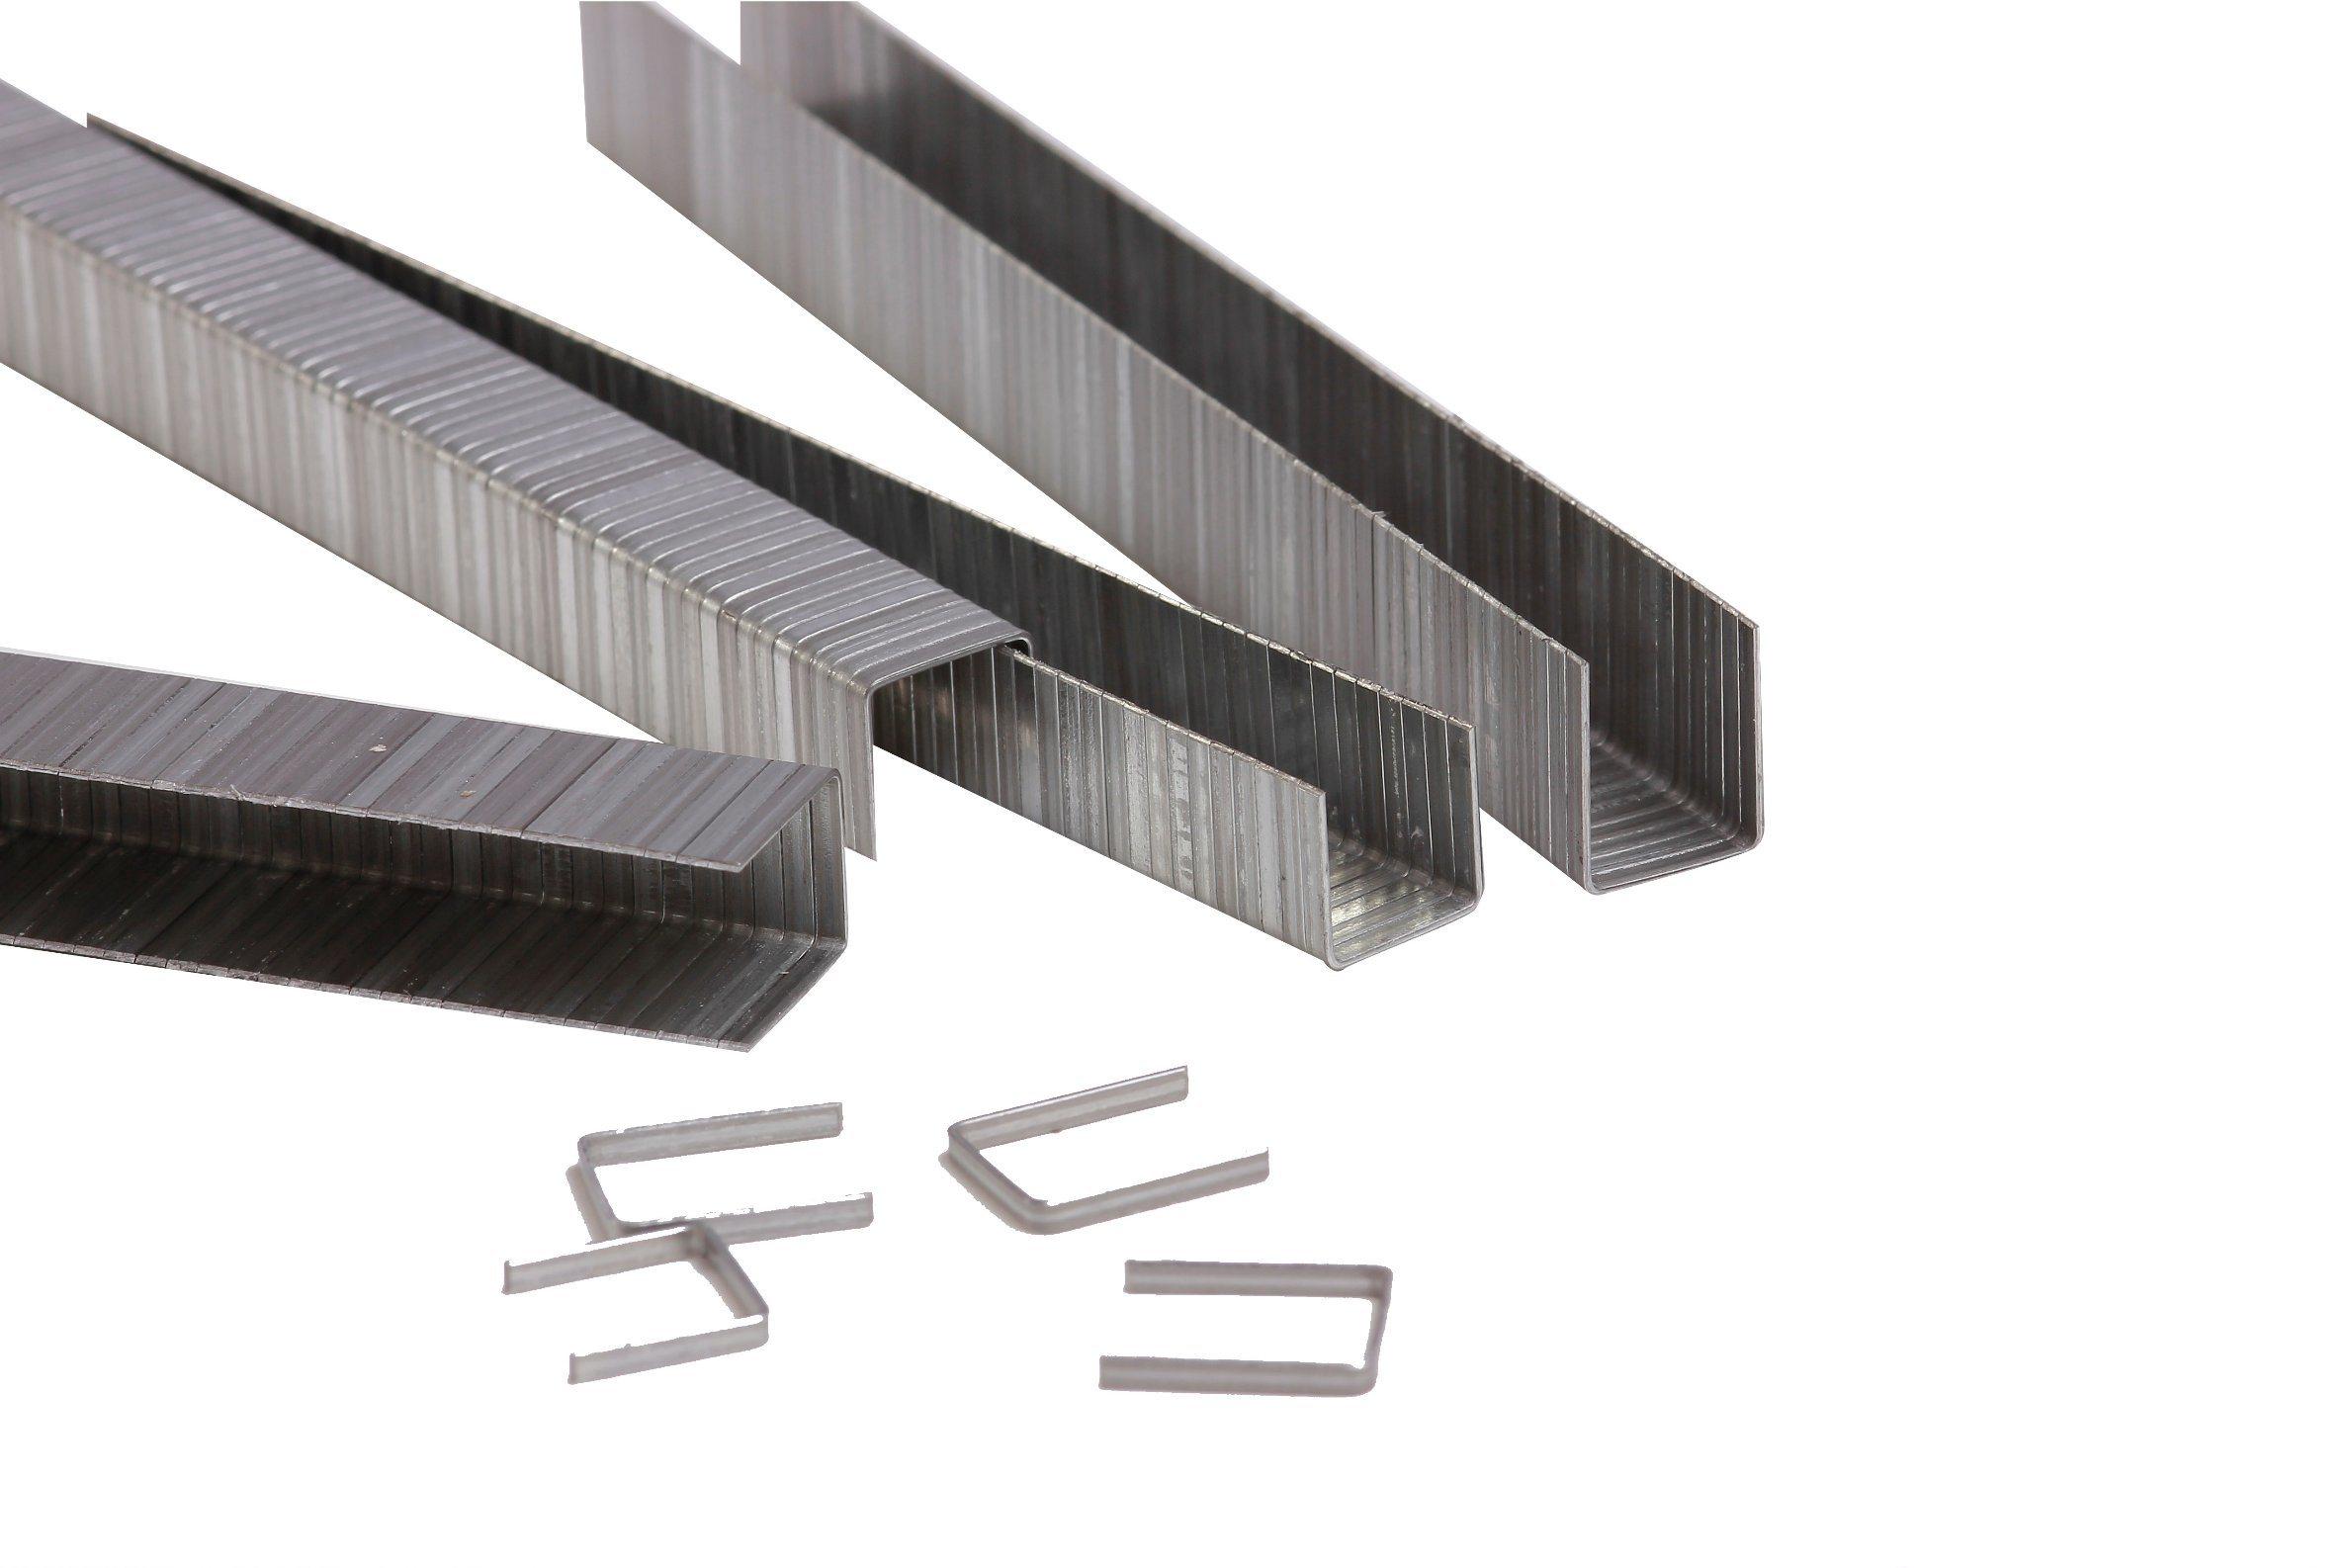 Grapa Industrial De La Serise A11 Cable